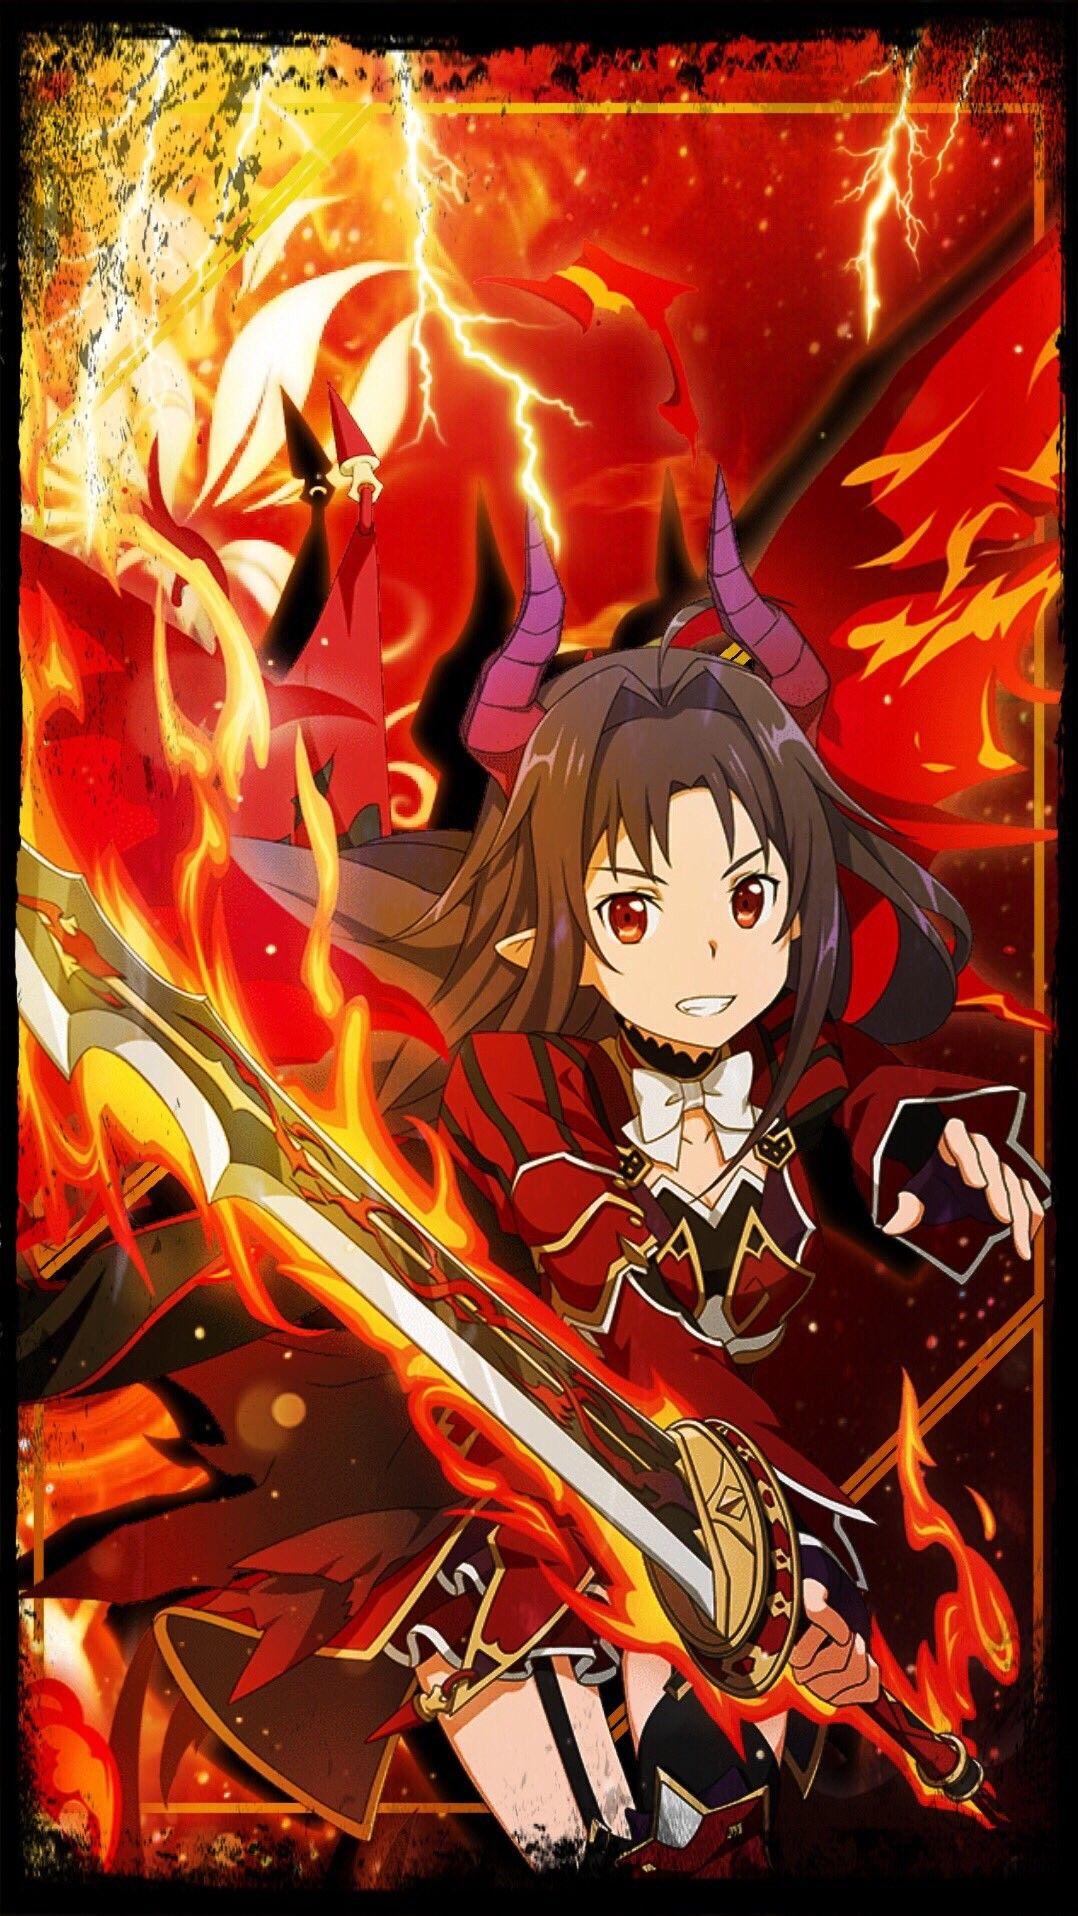 Pin By DuongNhi On Sword Art Online Memory Defrag